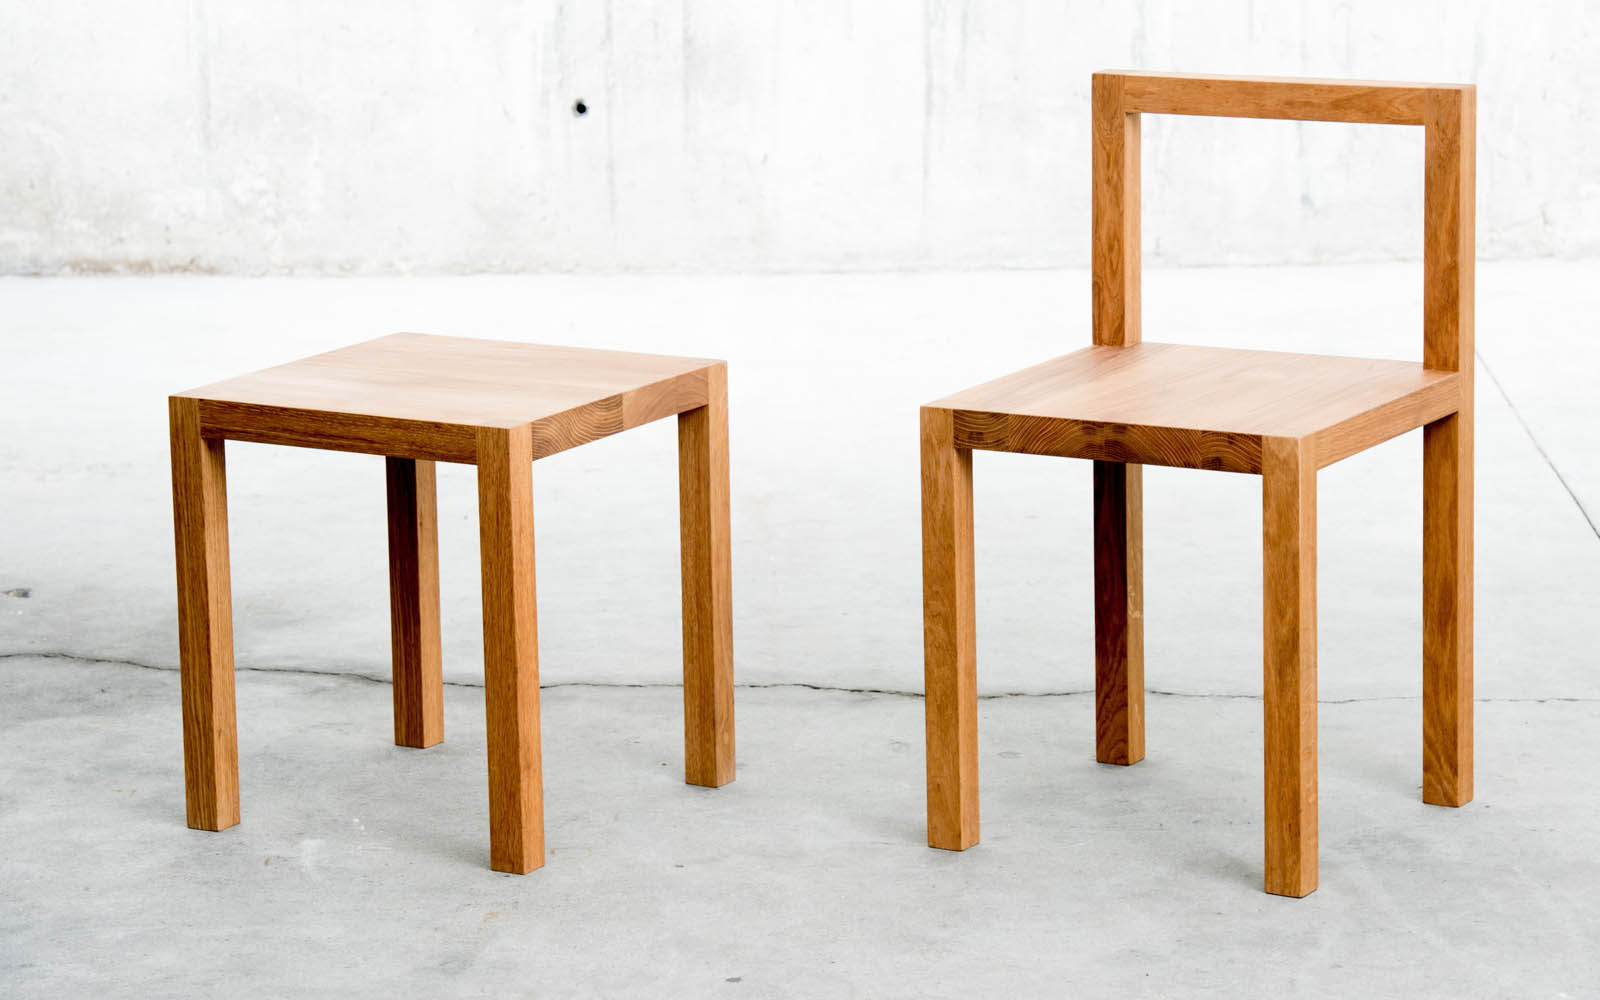 QoWood stool